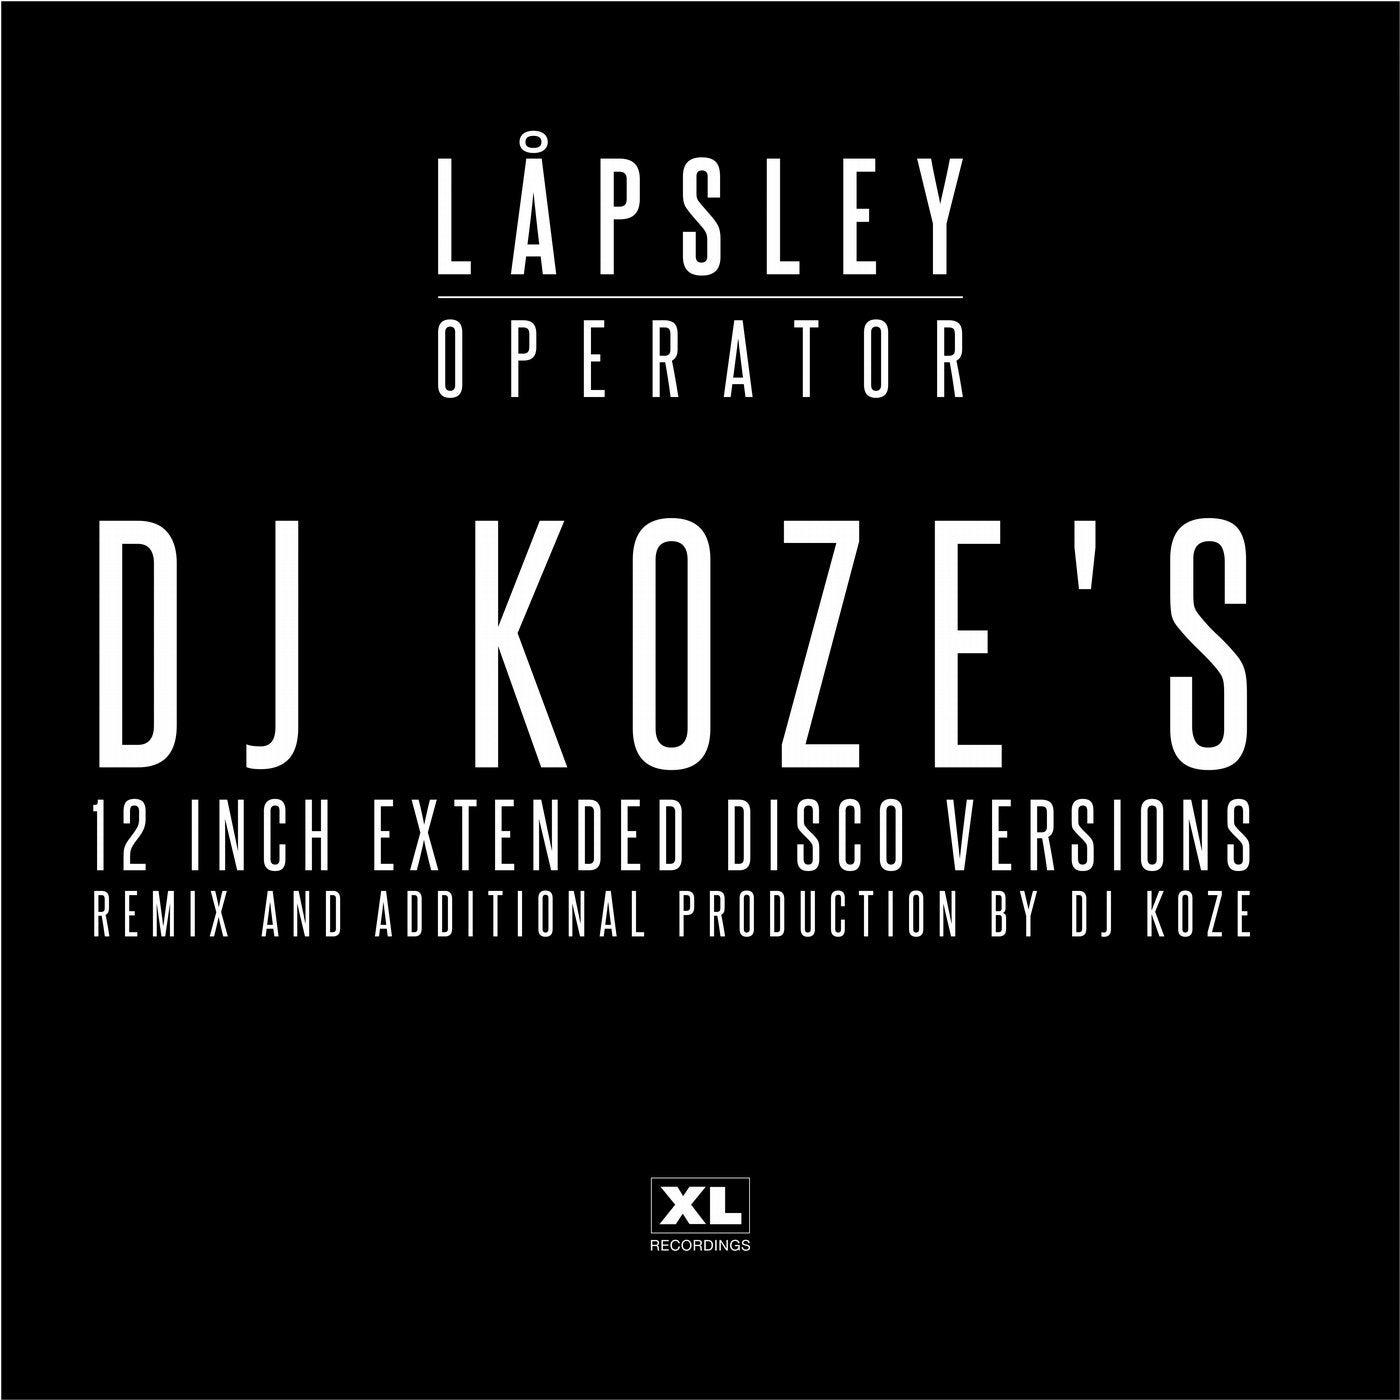 Operator (DJ Koze's 12 inch Extended Disco Version)